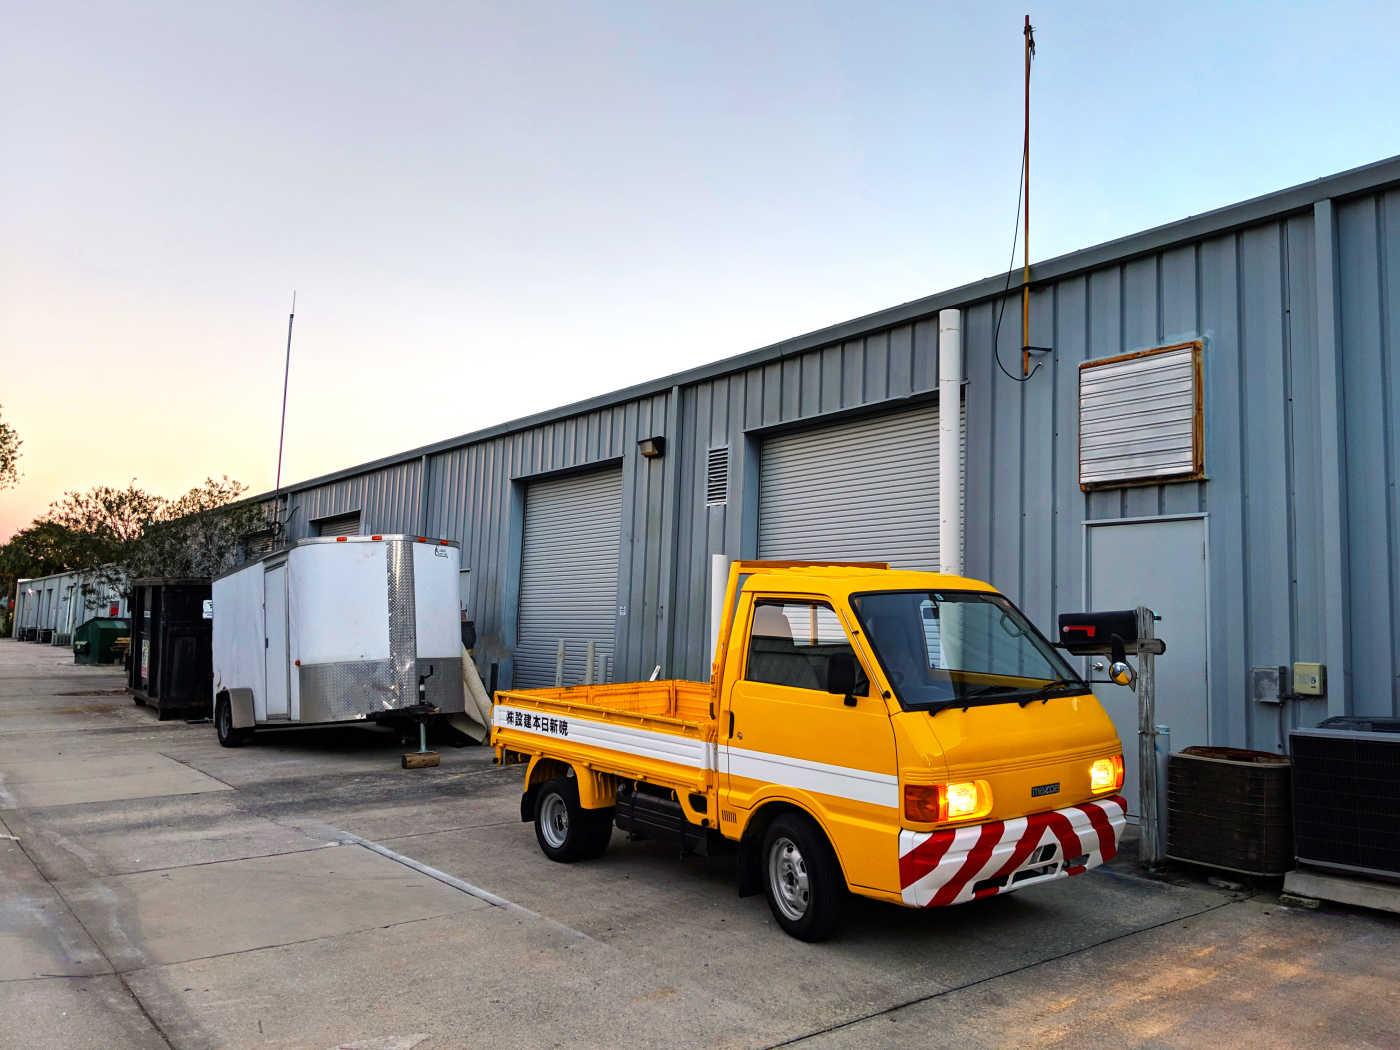 1991 Mazda Bongo Truck - Limerence Motor Co.